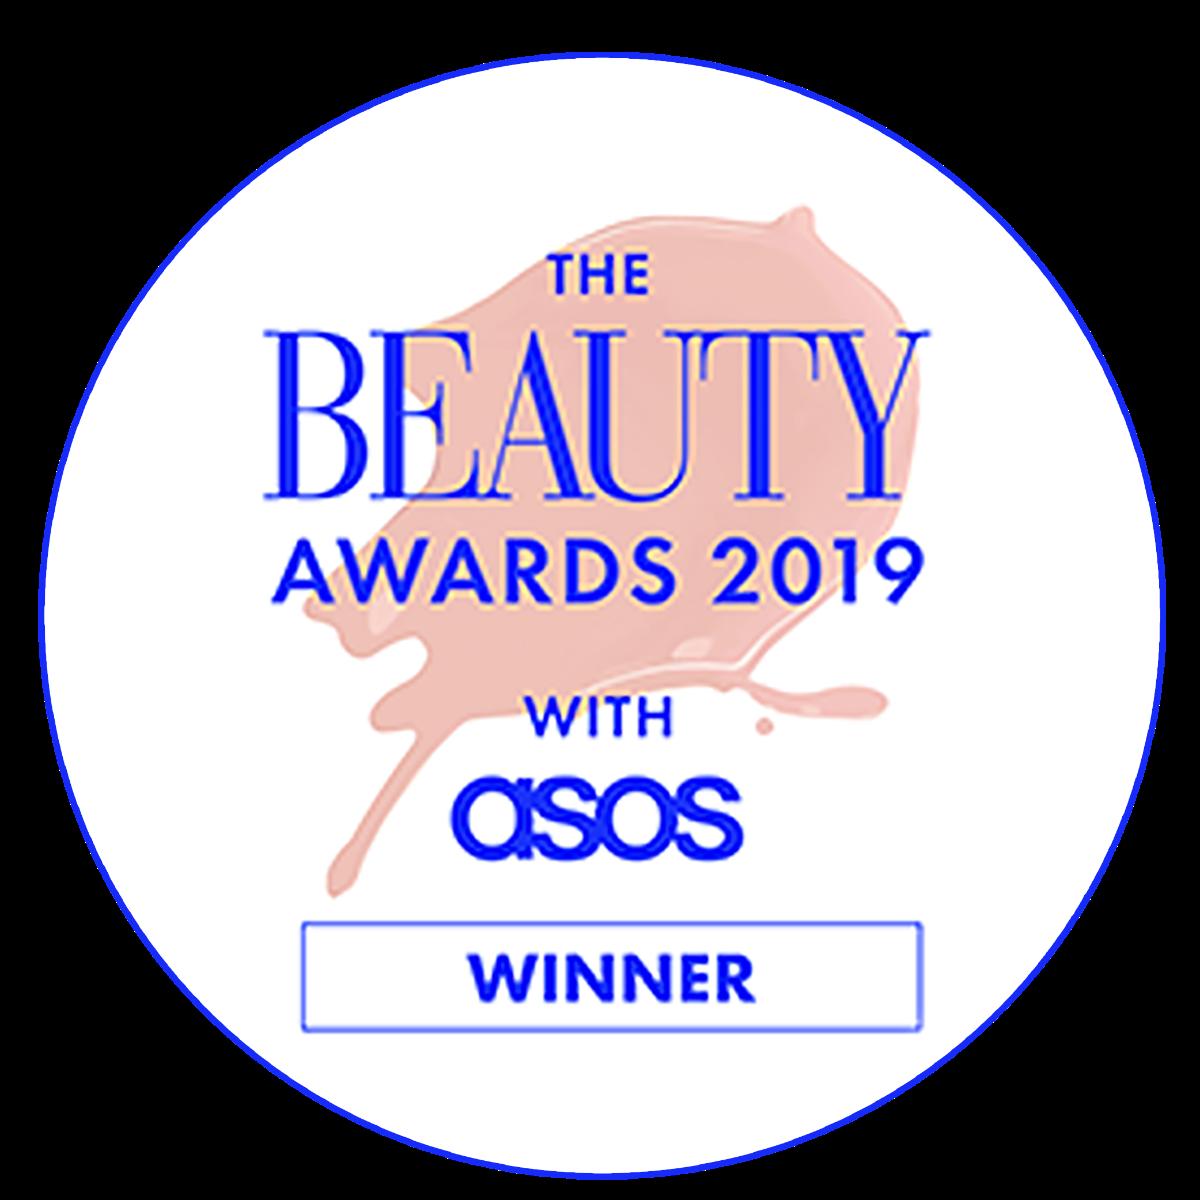 Beauty Awards with ASOS 2019 Winner